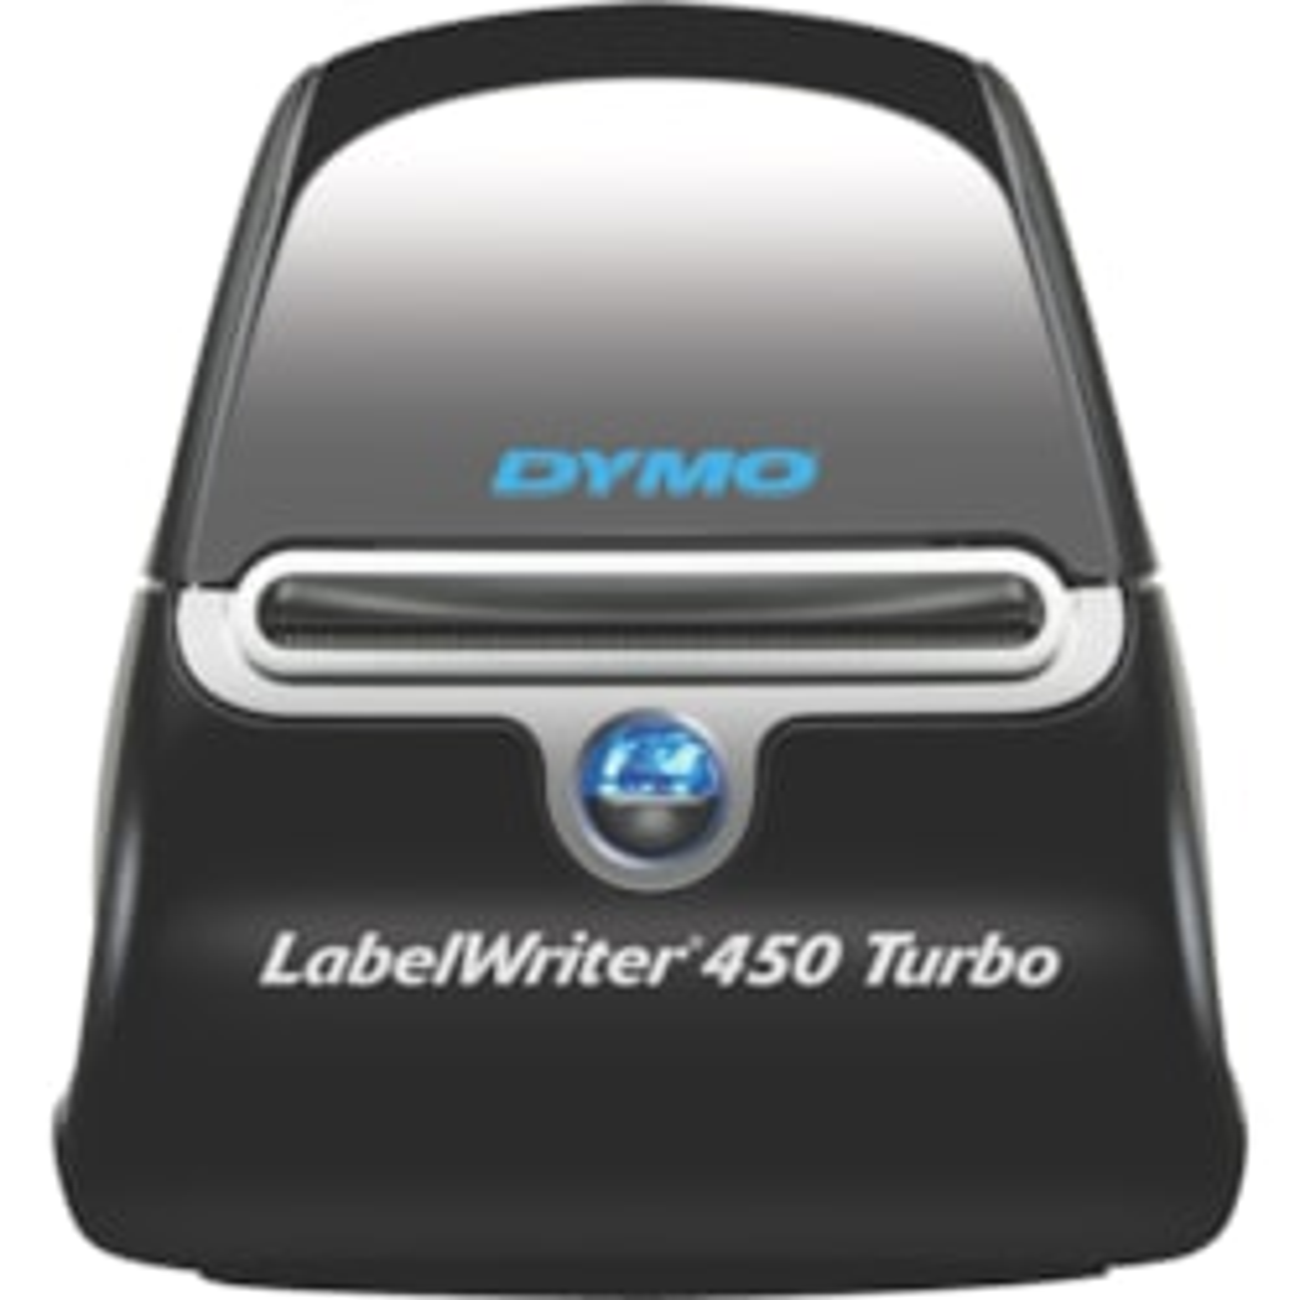 Dymo LabelWriter Turbo Direct Thermal Printer - Monochrome - Desktop - Label Print